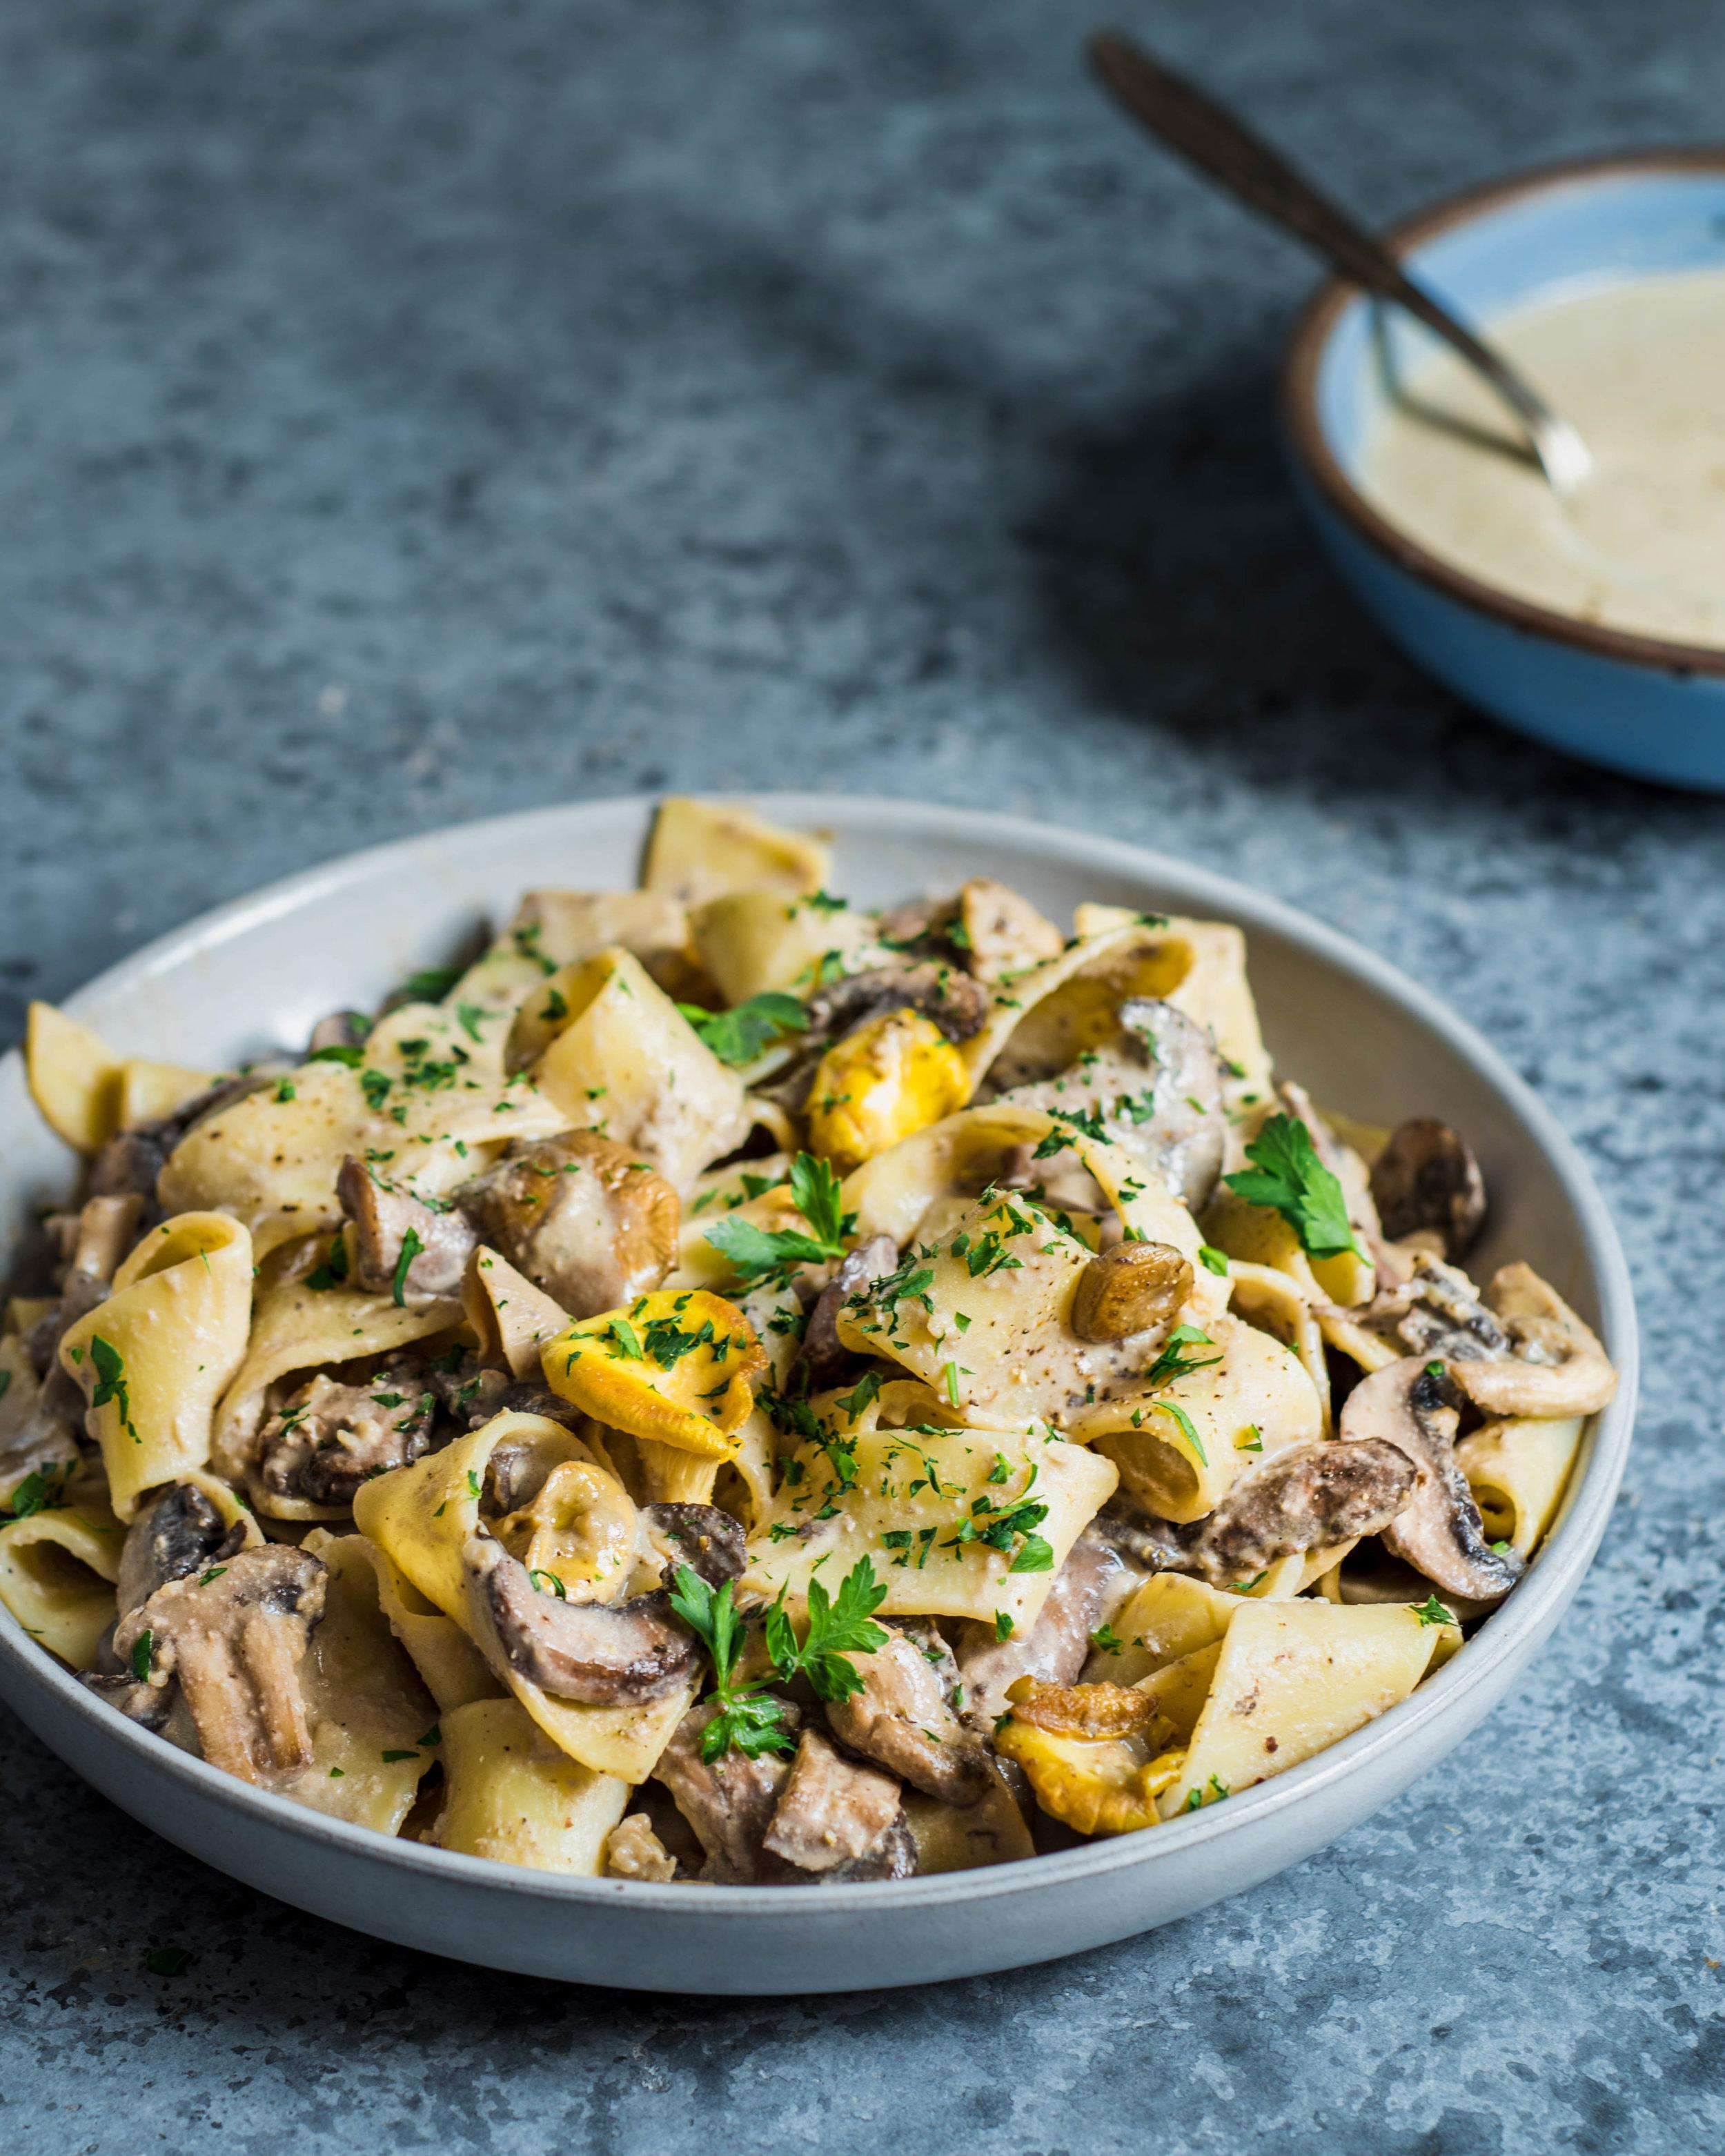 5-Ingredient Vegan Recipes, Creamy Vegan Mushroom Pasta